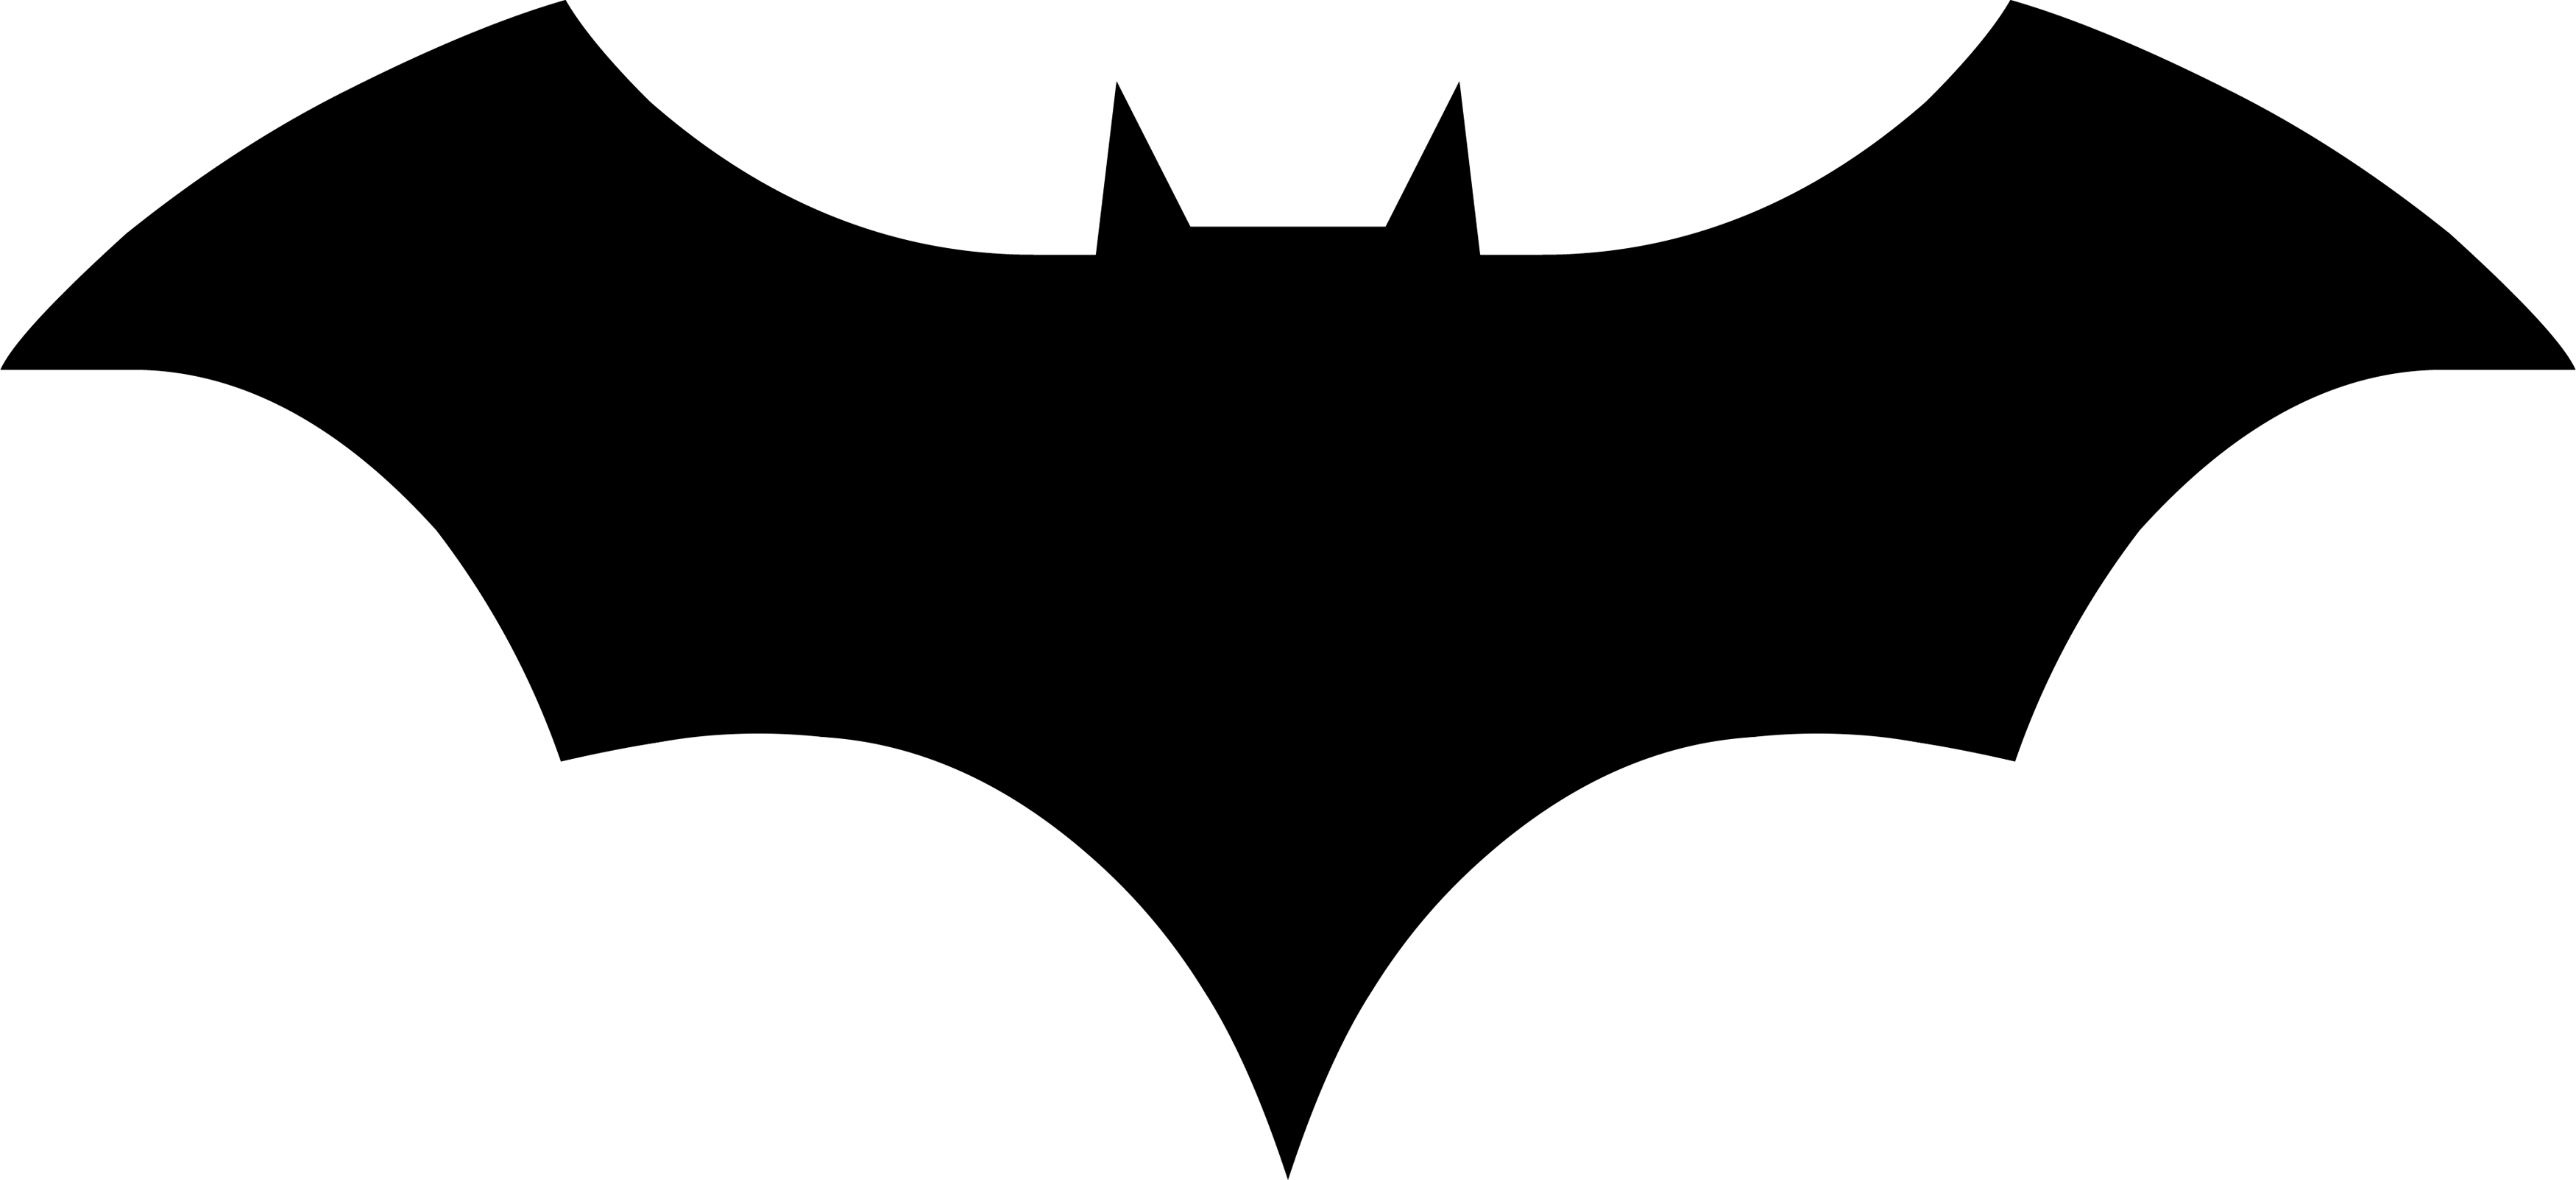 3500x1603 Batman Dead End Emblem By JAMESNG8 On DeviantArt